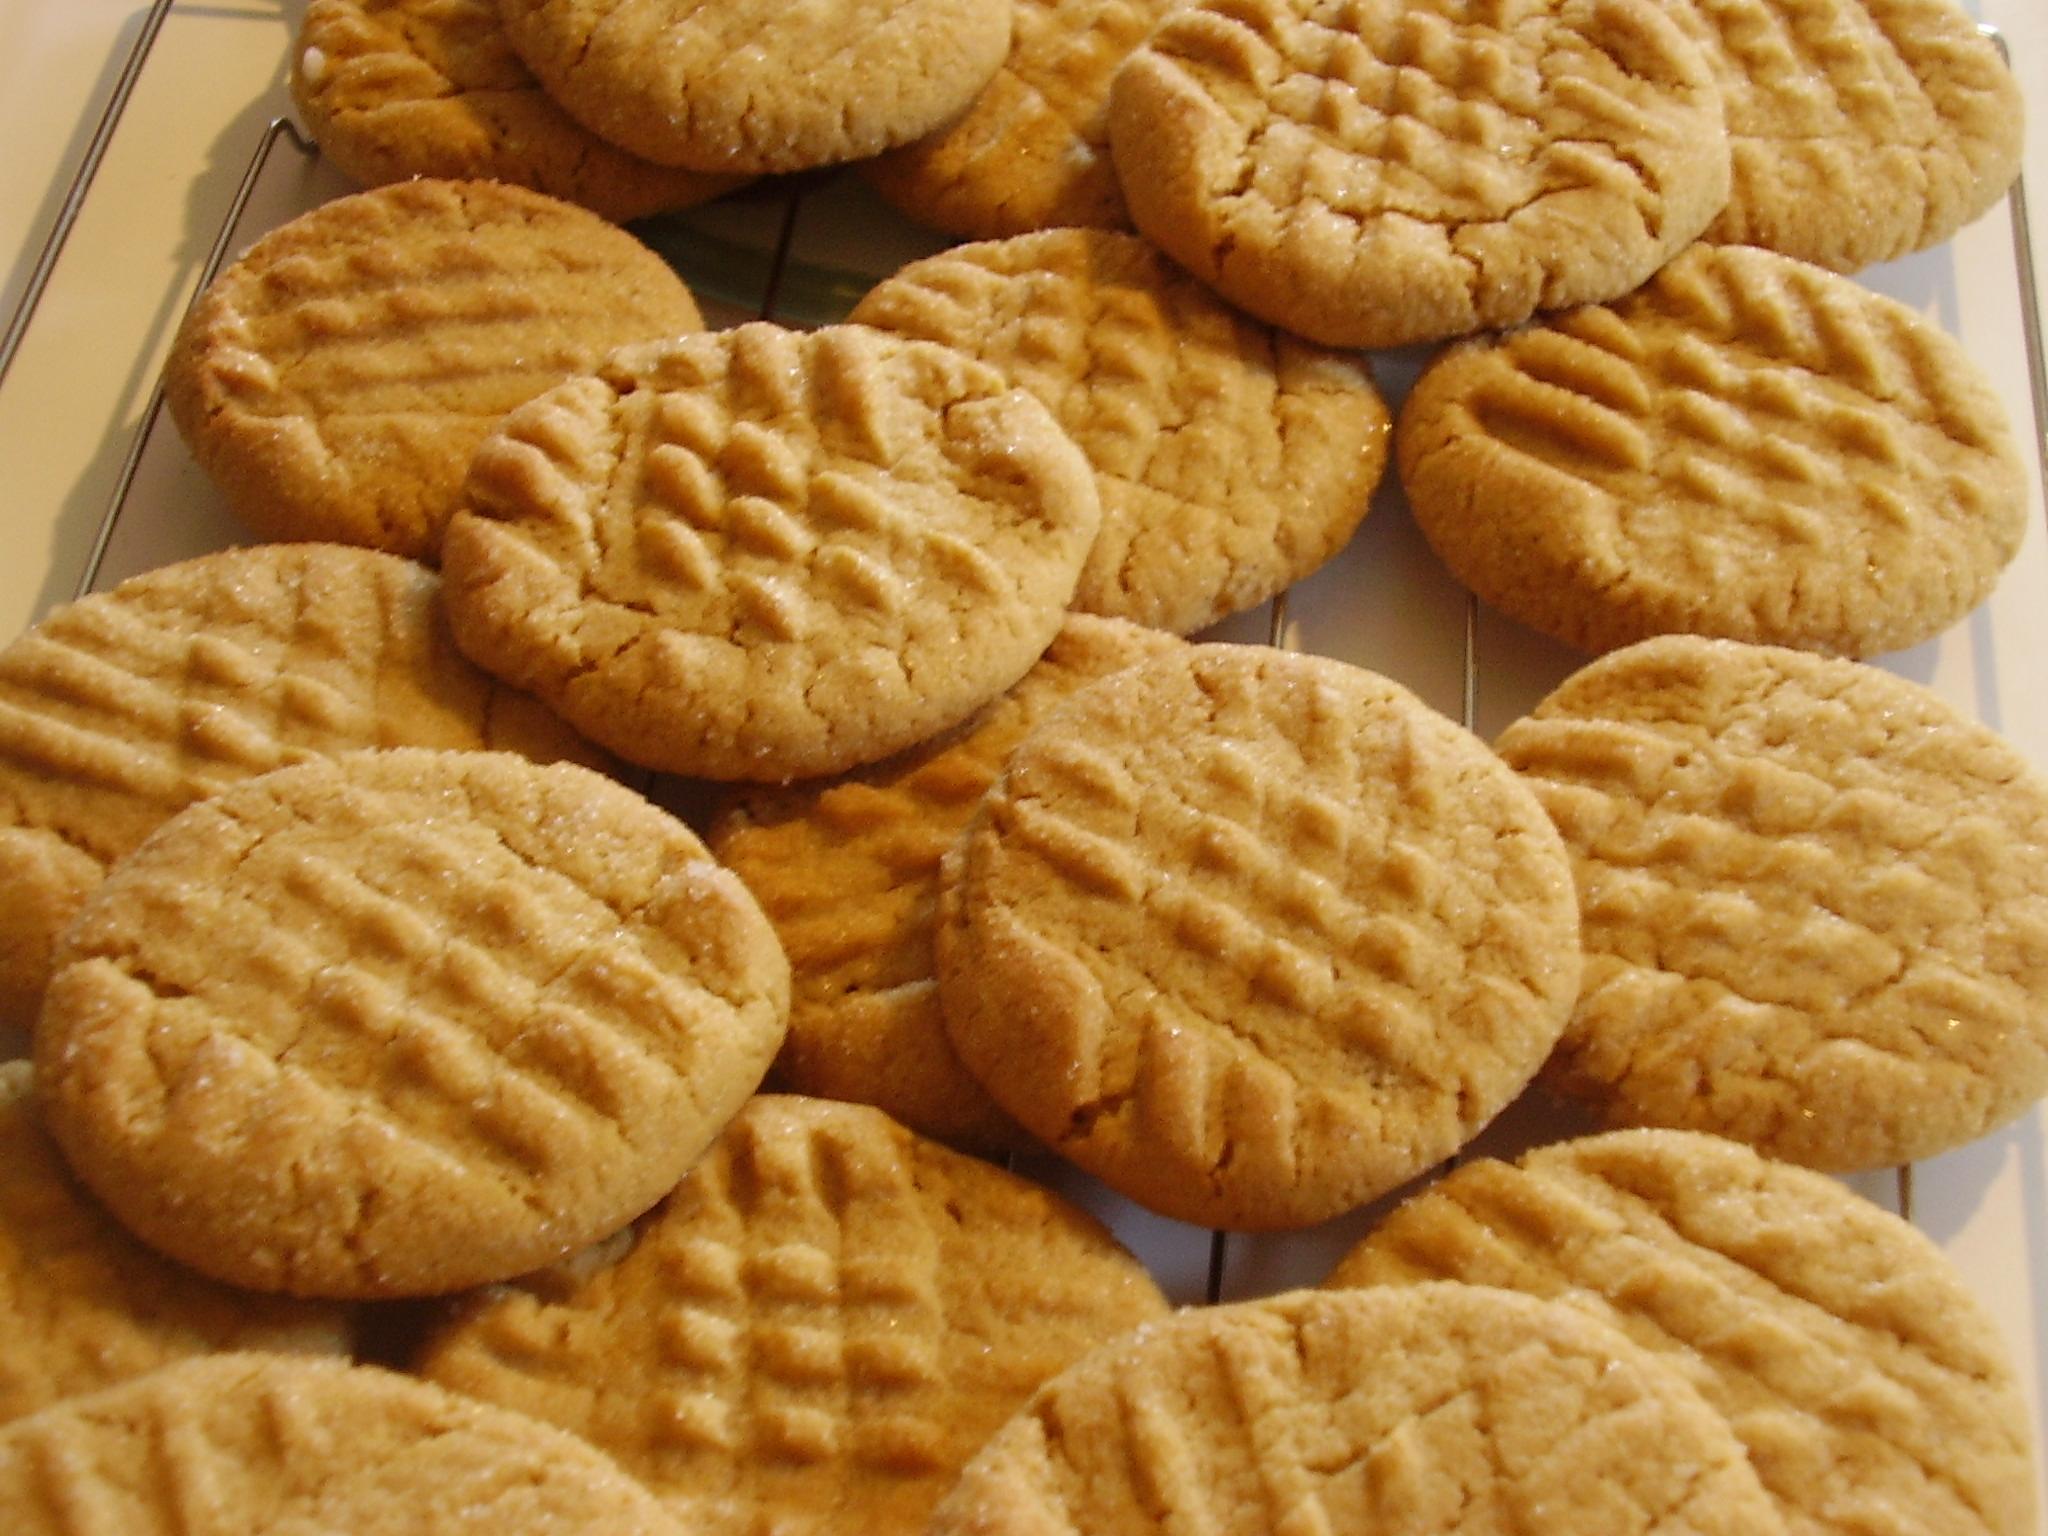 Big Batch Peanut Butter Cookies